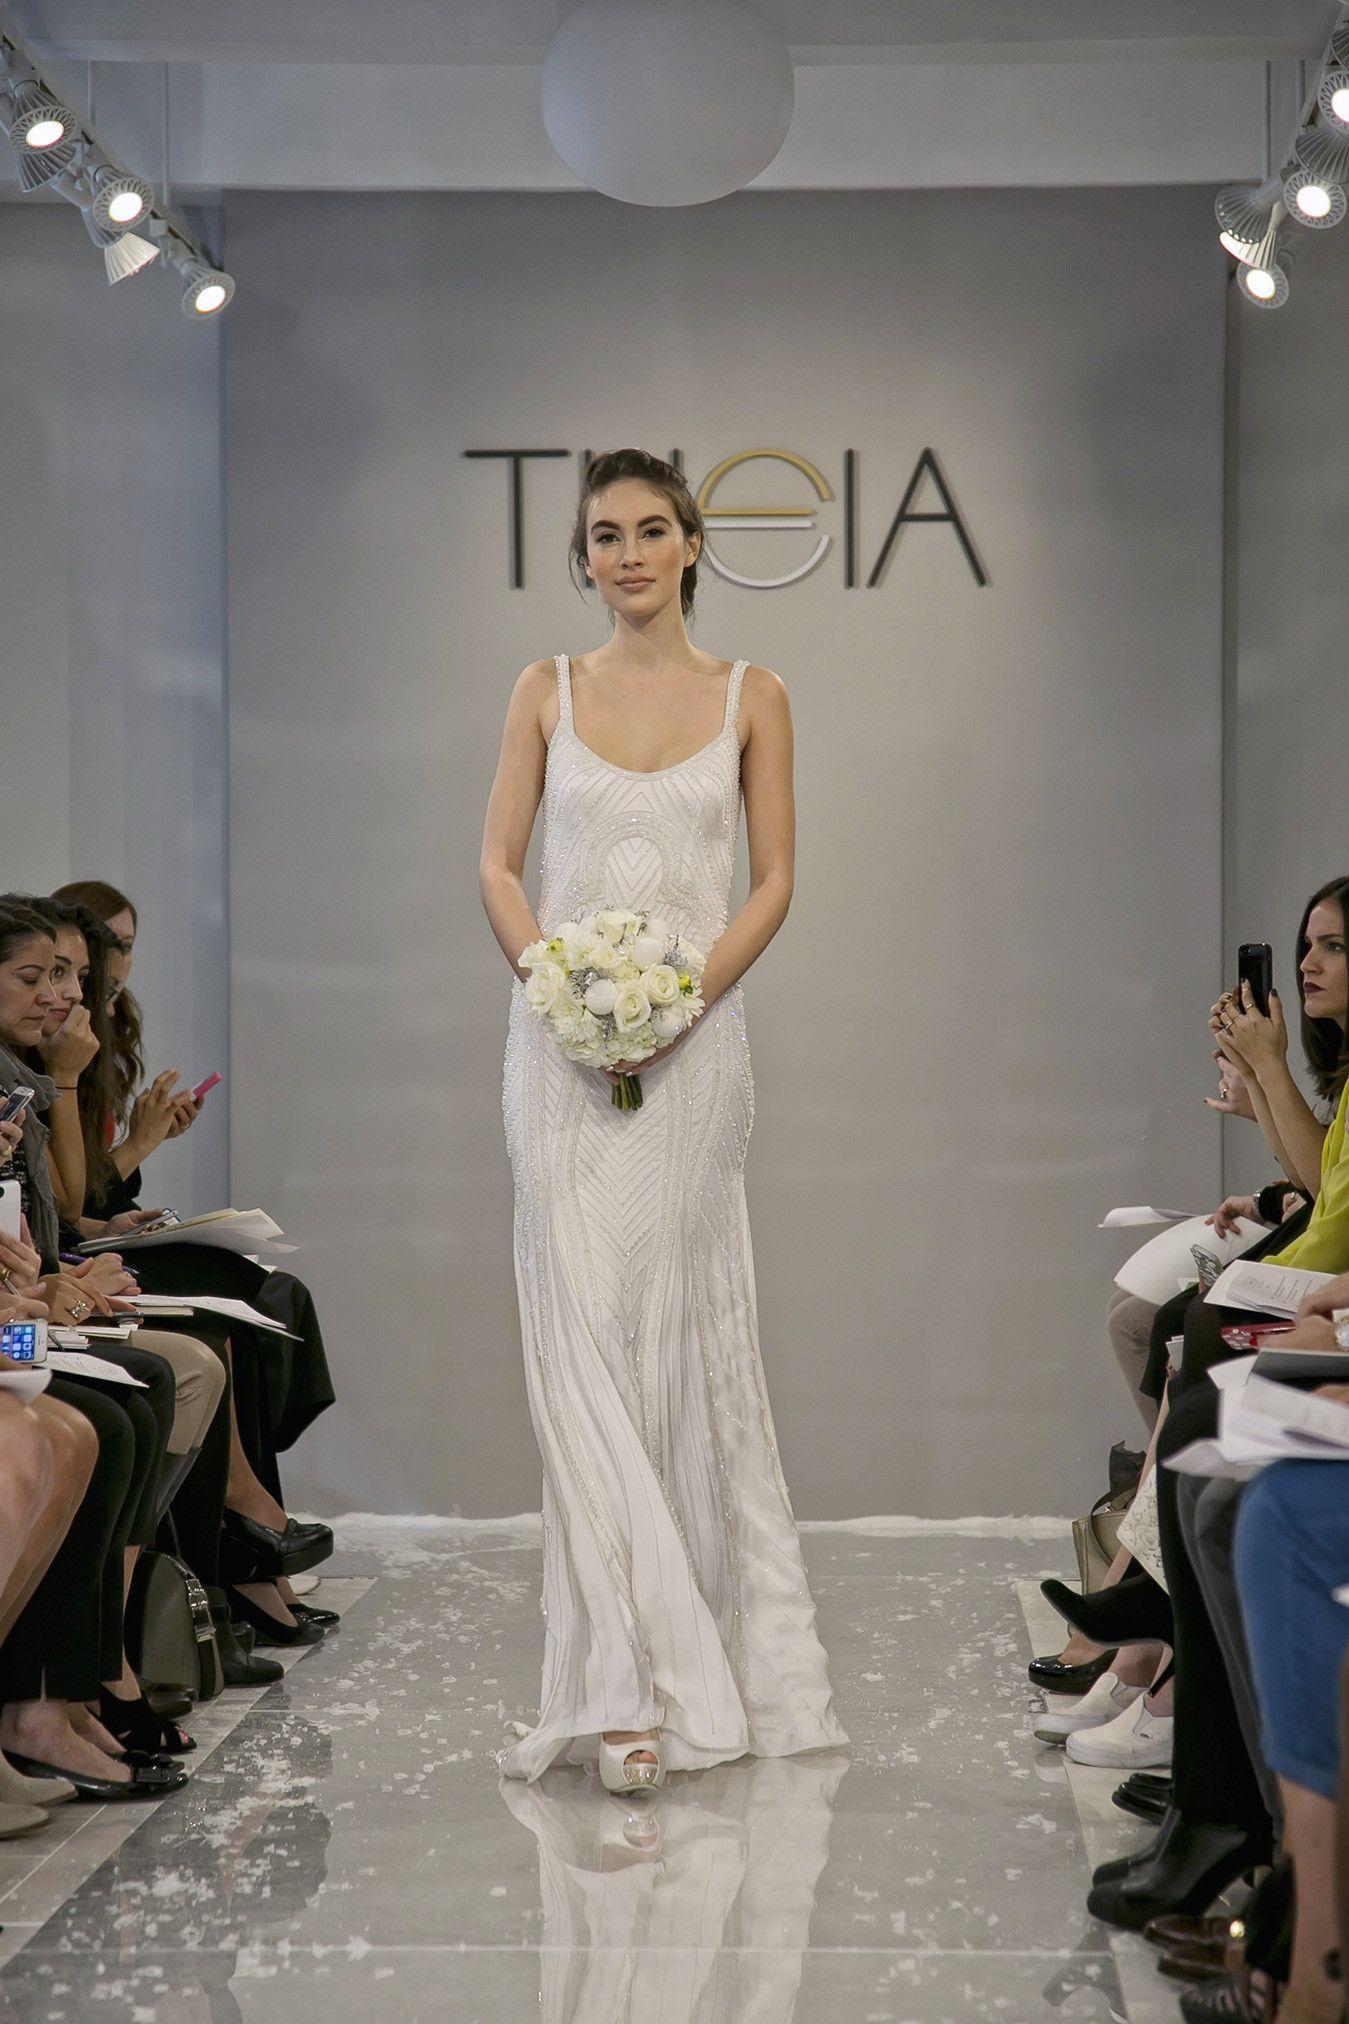 Theia wedding dresses  Suana u THEIA  Wedding Dresses  Pinterest  Simple weddings